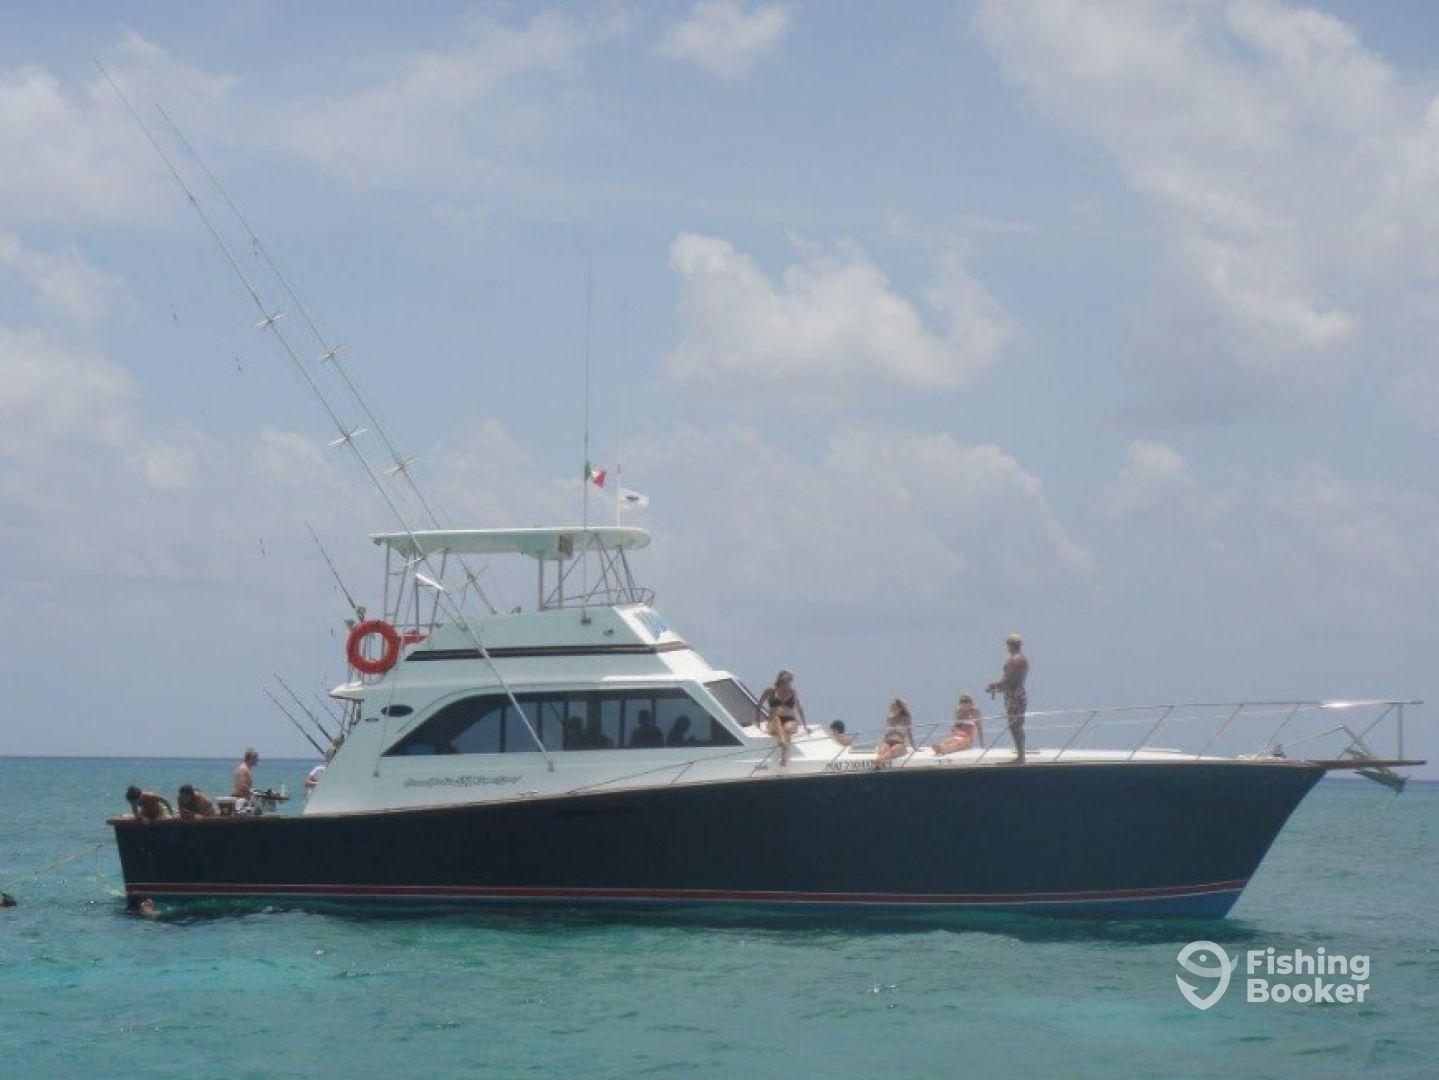 Vamonos sportfishing cozumel mexico fishingbooker for Cozumel fishing charters